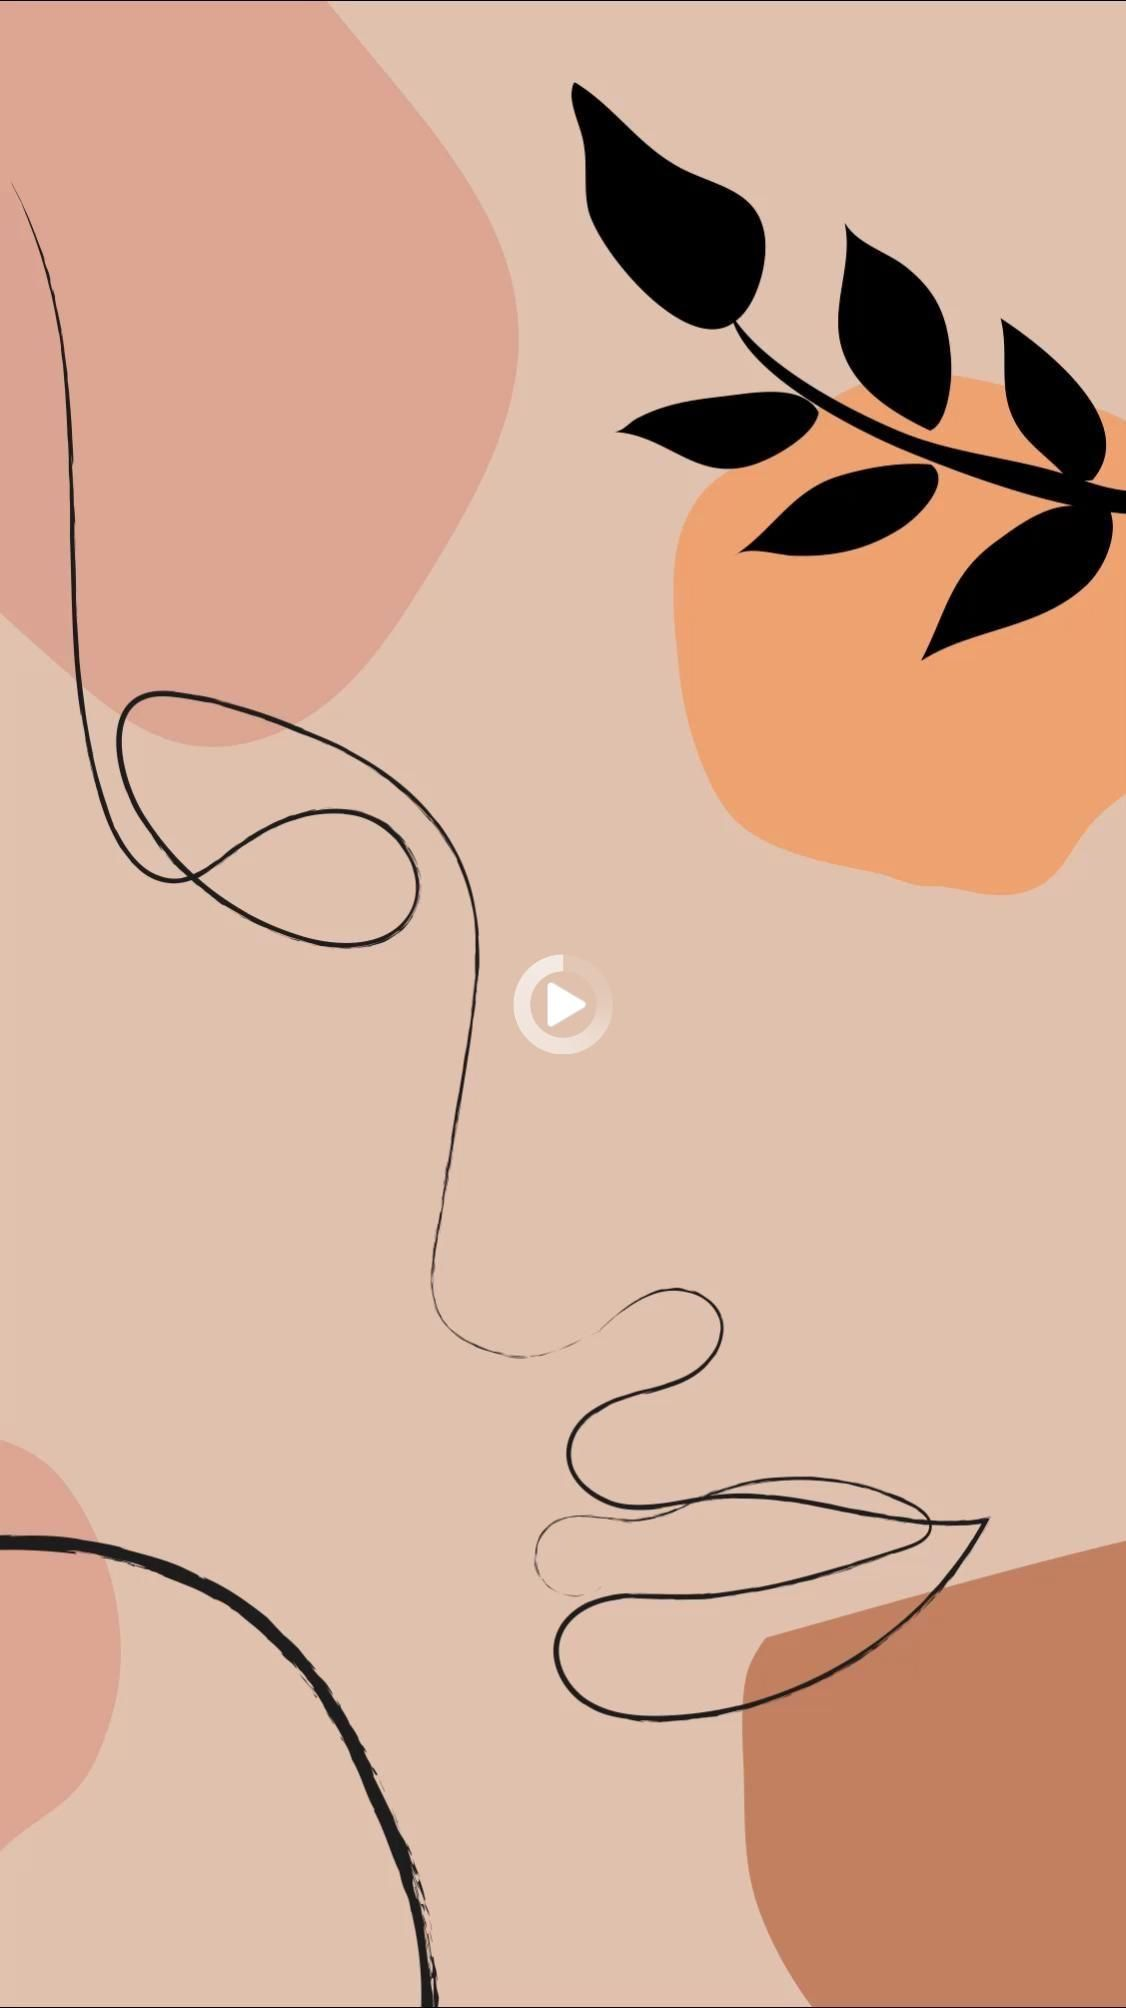 Respirar In 2021 Abstract Wallpaper Design Abstract Wallpaper Backgrounds Cute Patterns Wallpaper